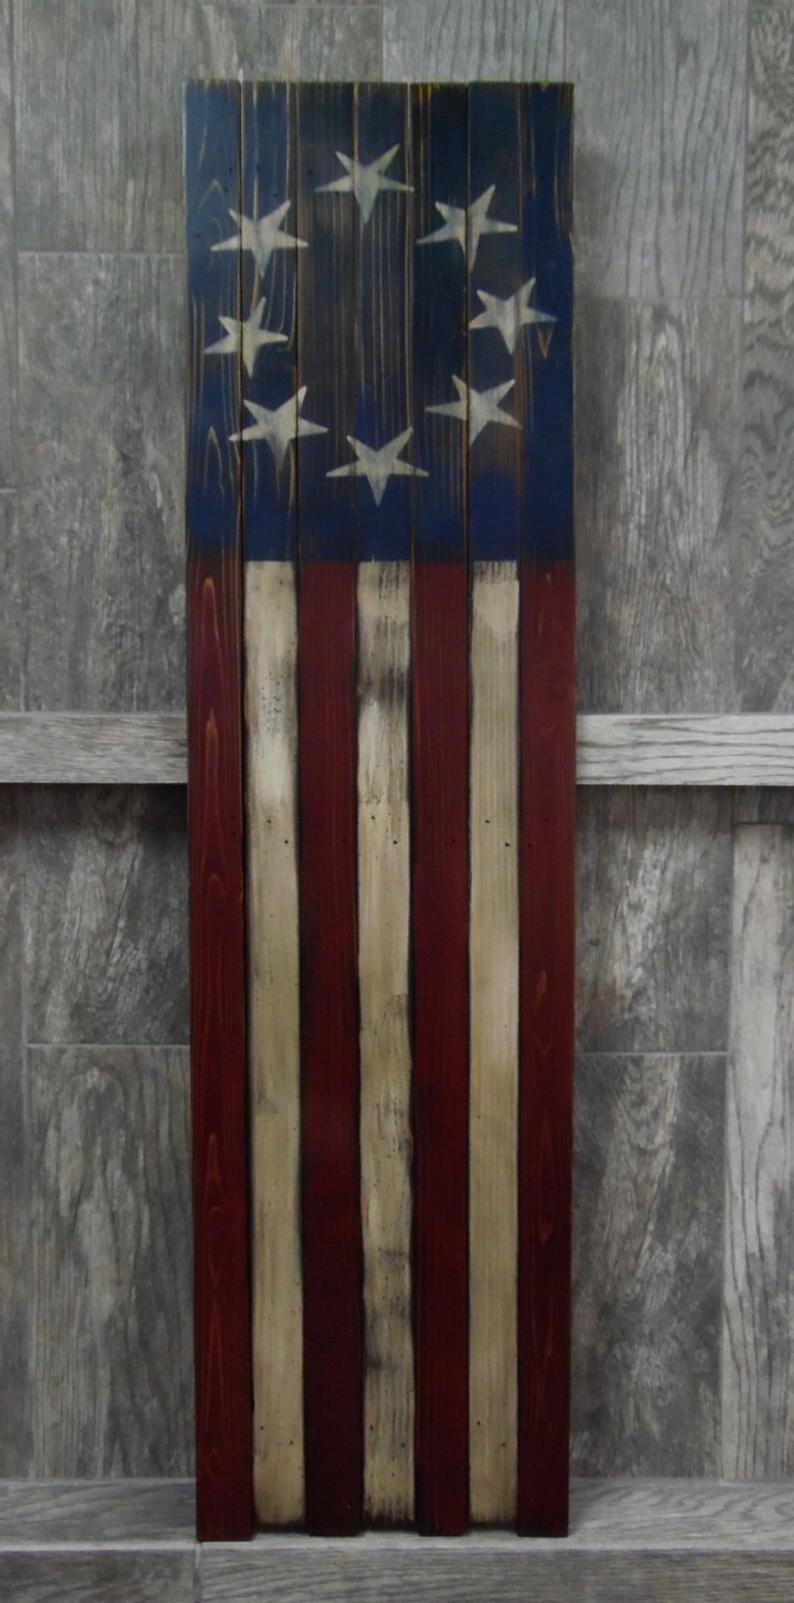 Primitive Vertical American Flag Or Horizontal American Flag Etsy In 2020 American Flag Wood American Flag Painting Rustic Flags